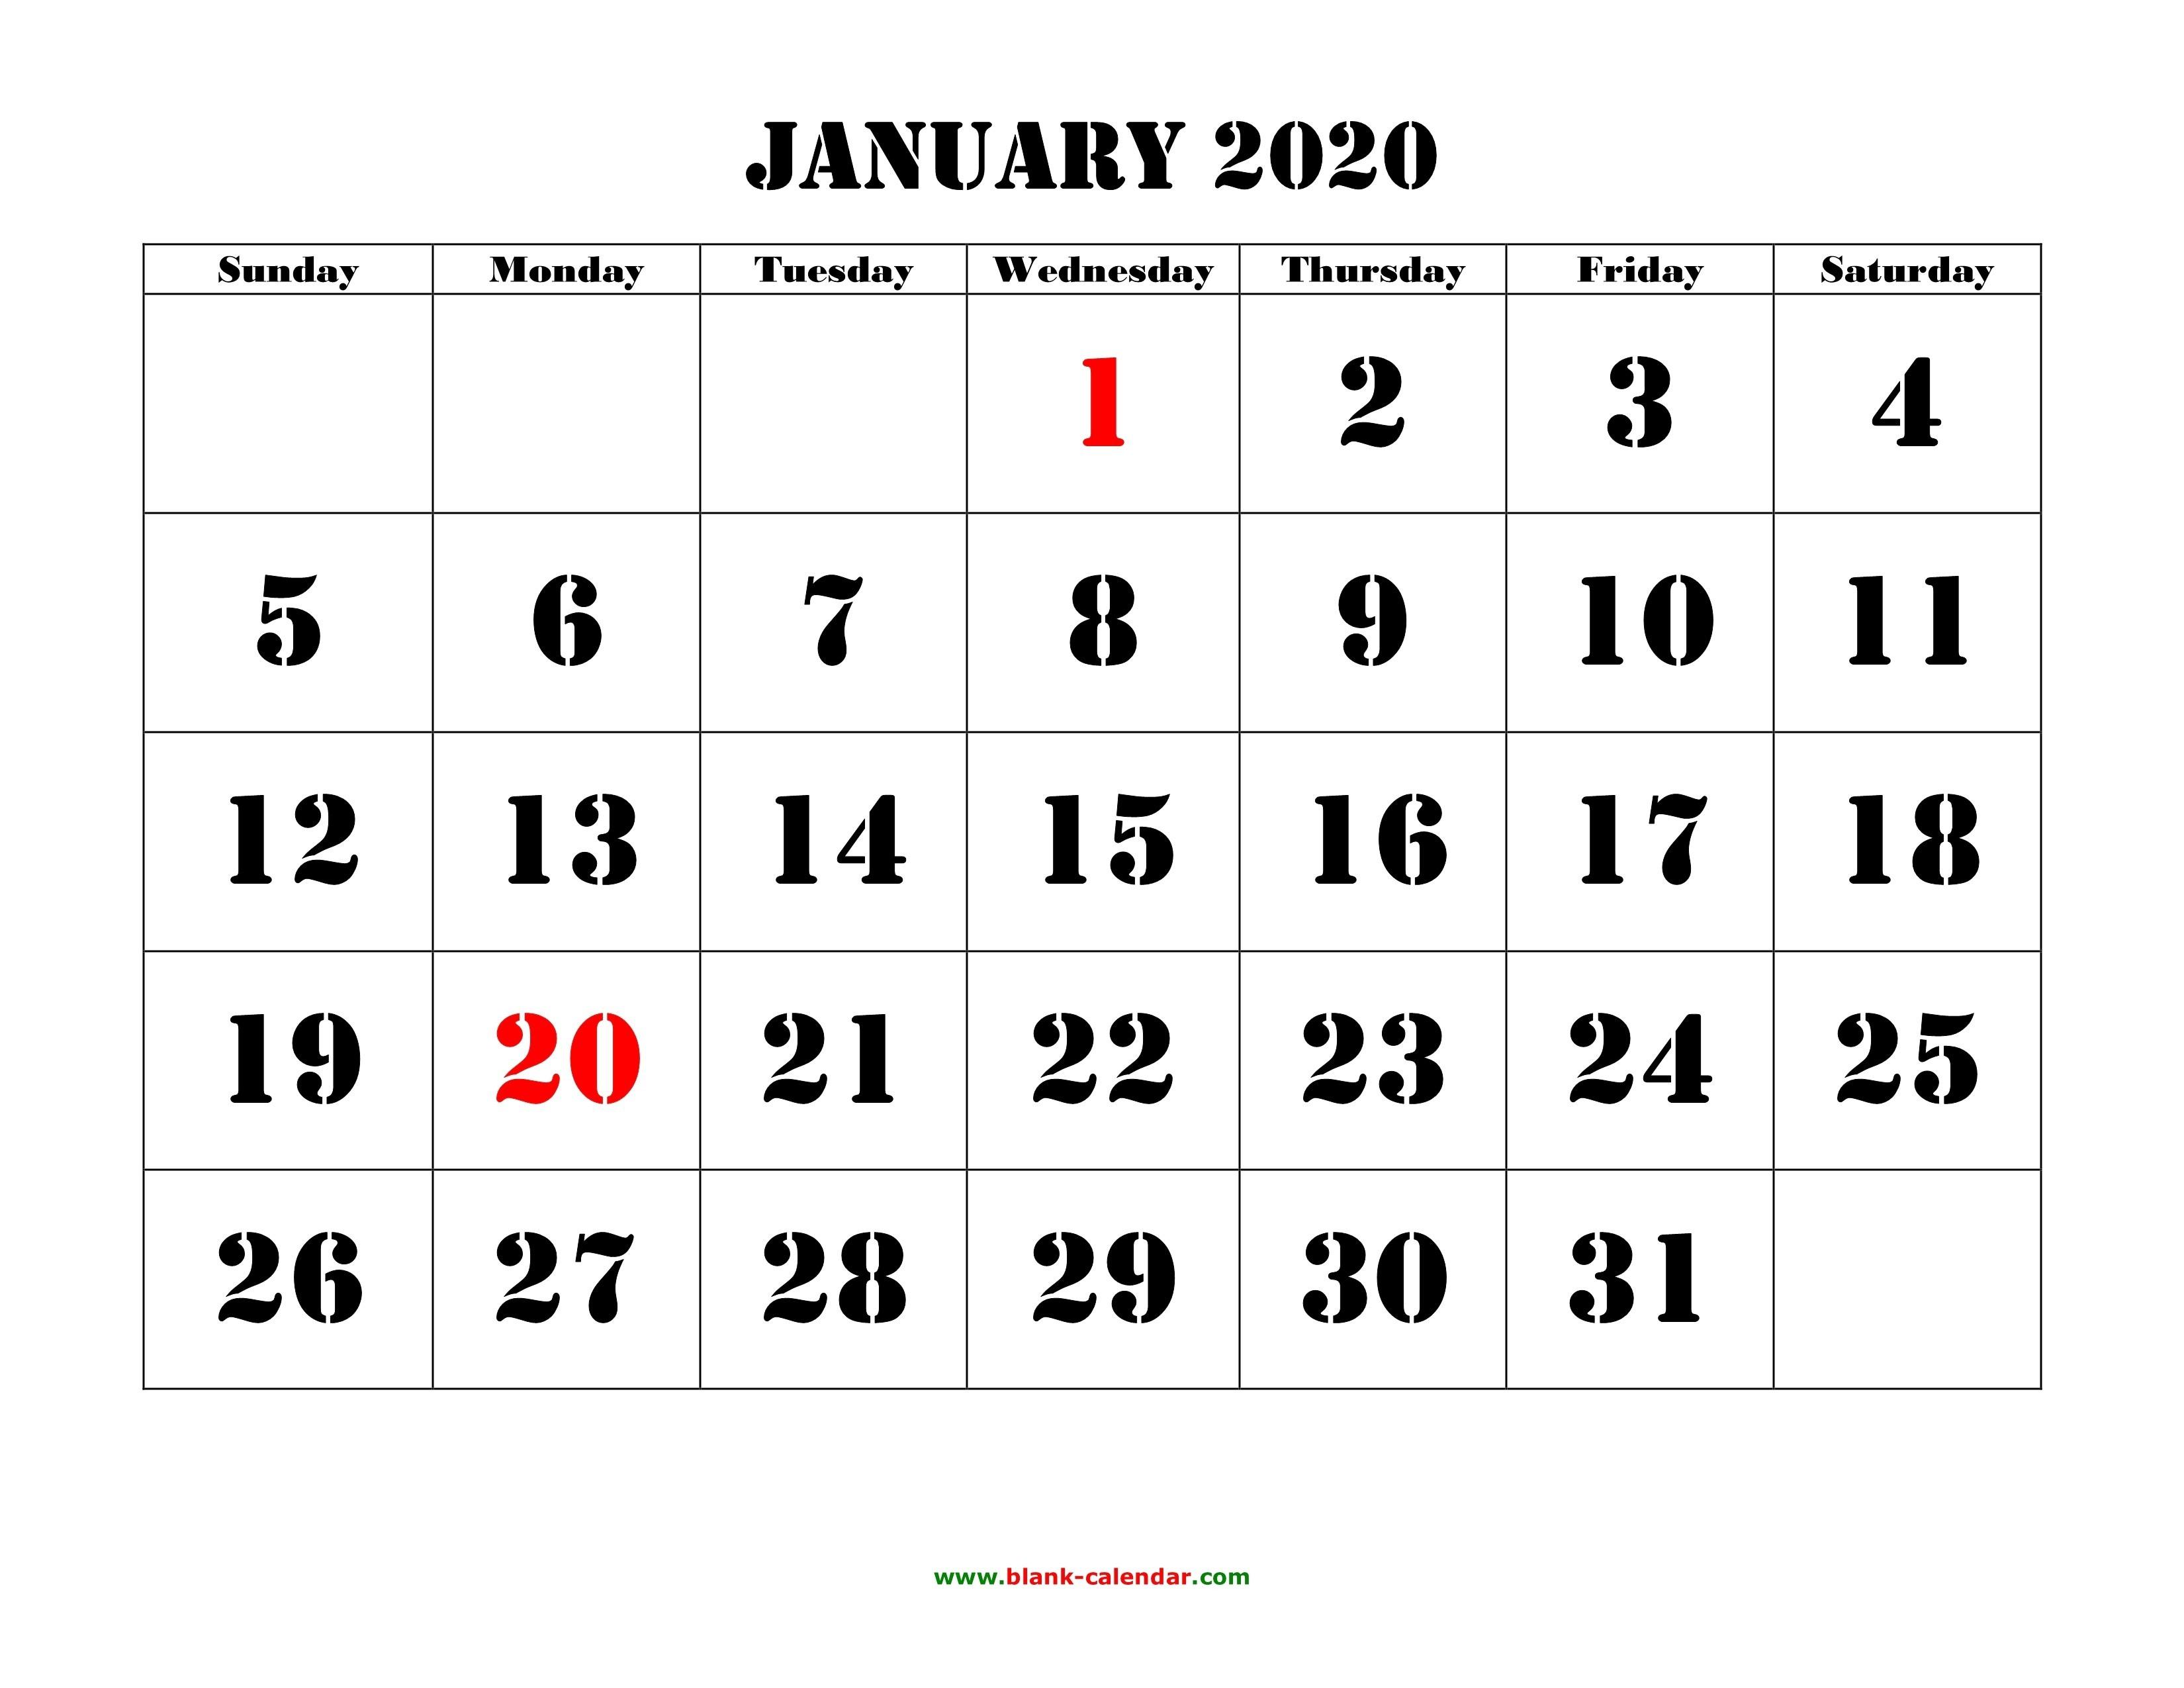 Telugu Calendar 2020 January | Calendar Printable Free-January 2020 Calendar Drik Panchang